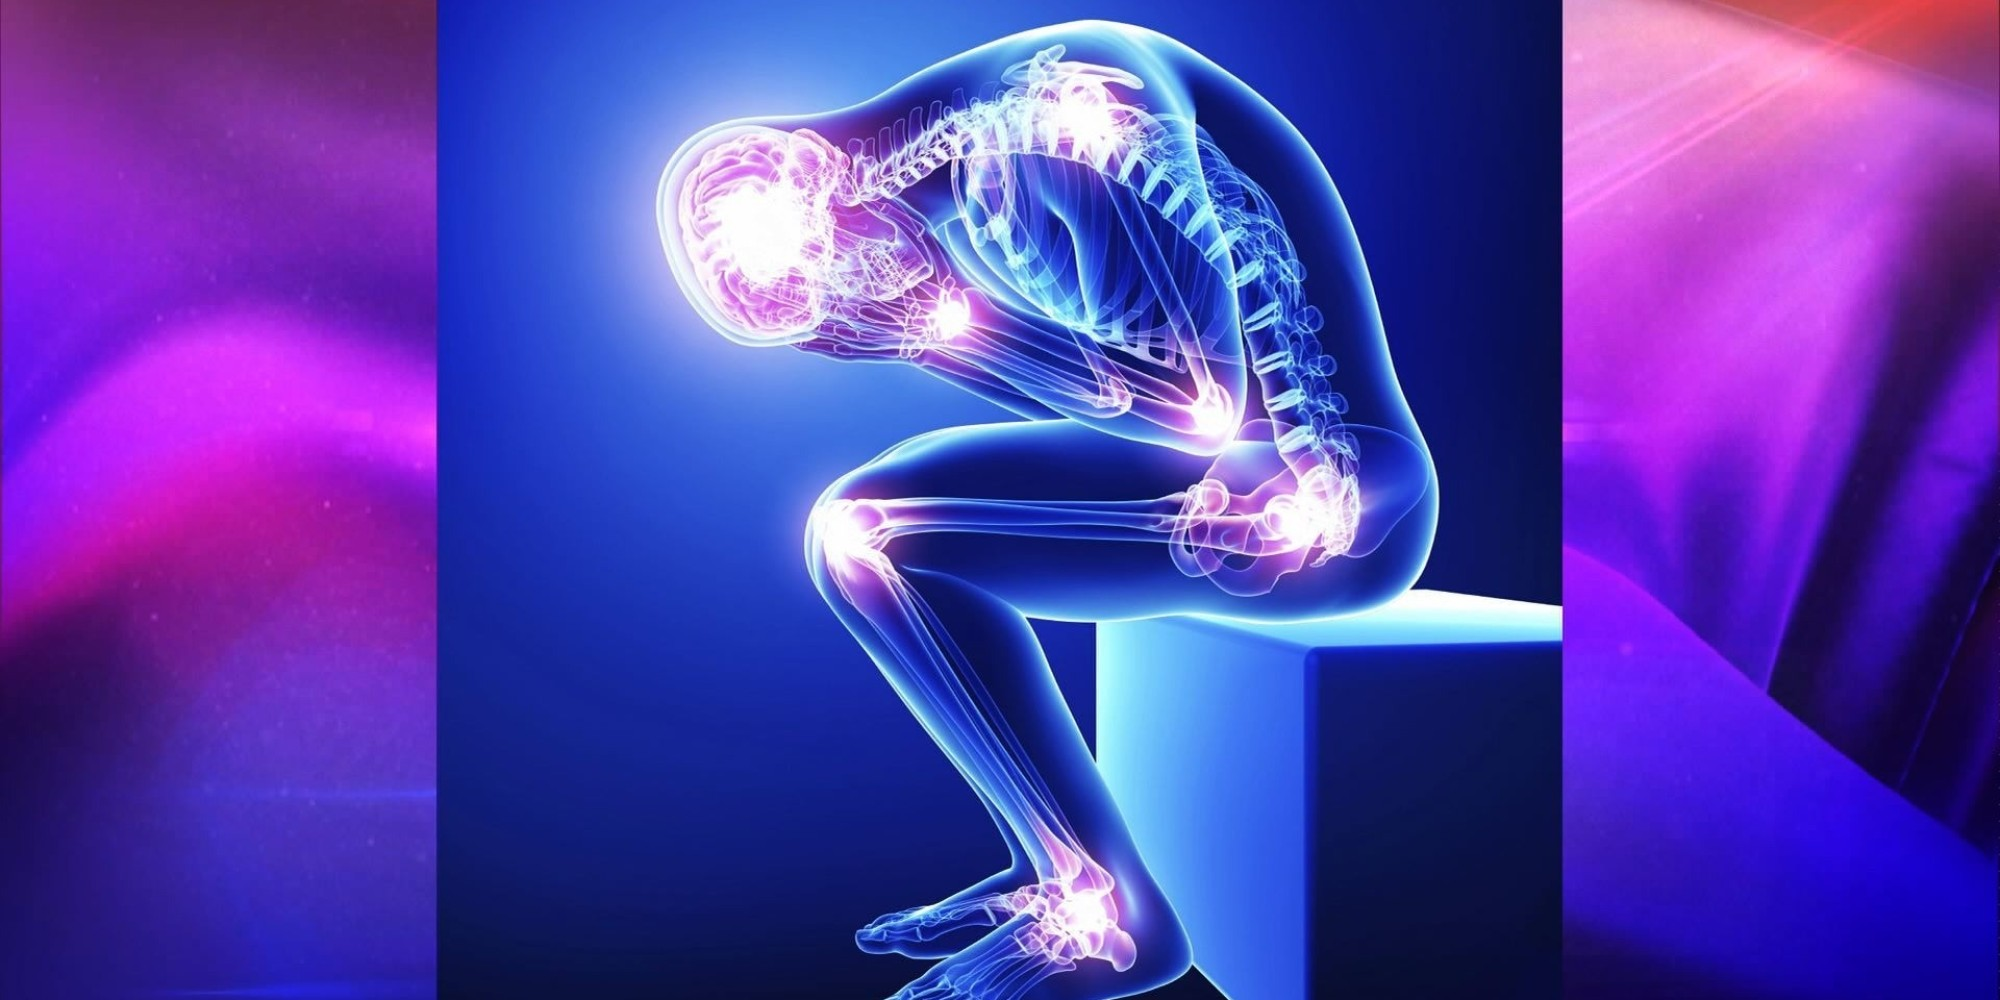 gejala fibromyalgia